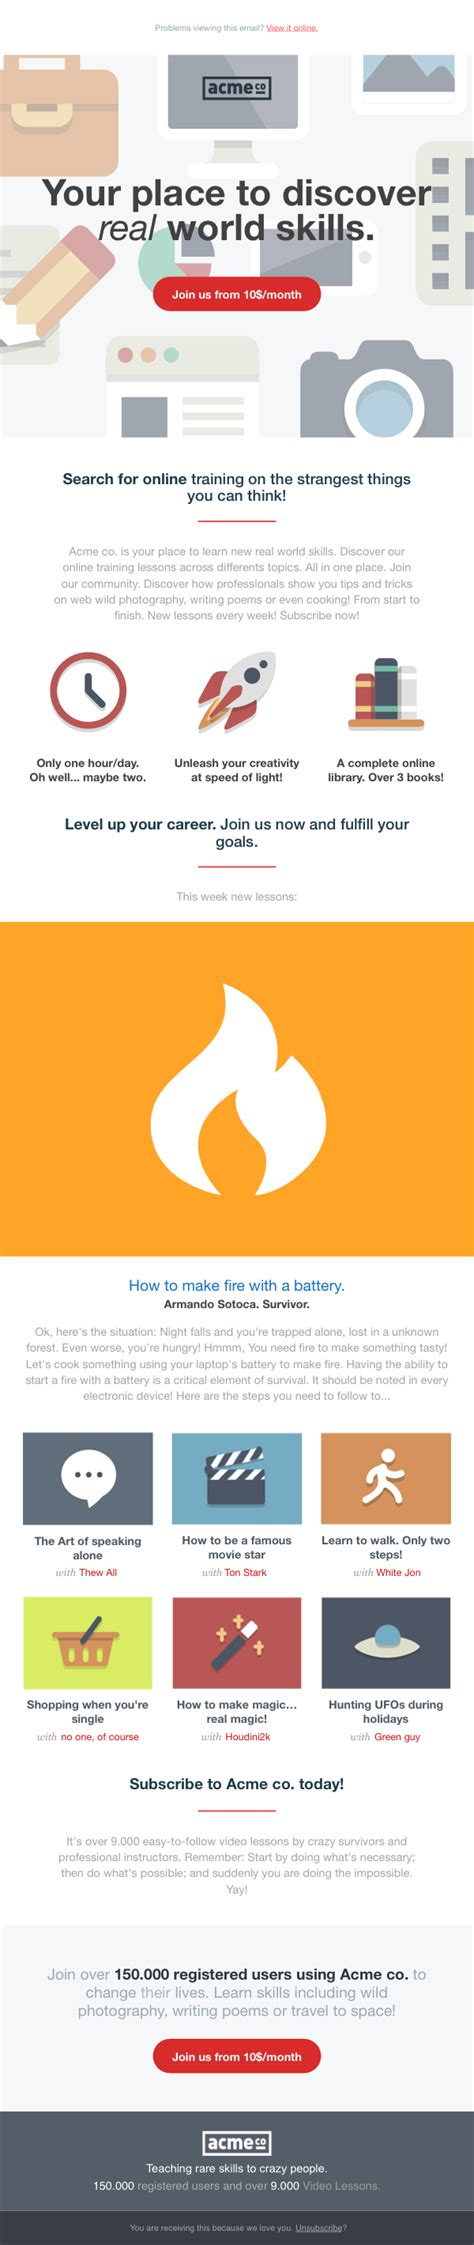 website newsletter tutorial sketch for beginners design a bold email newsletter